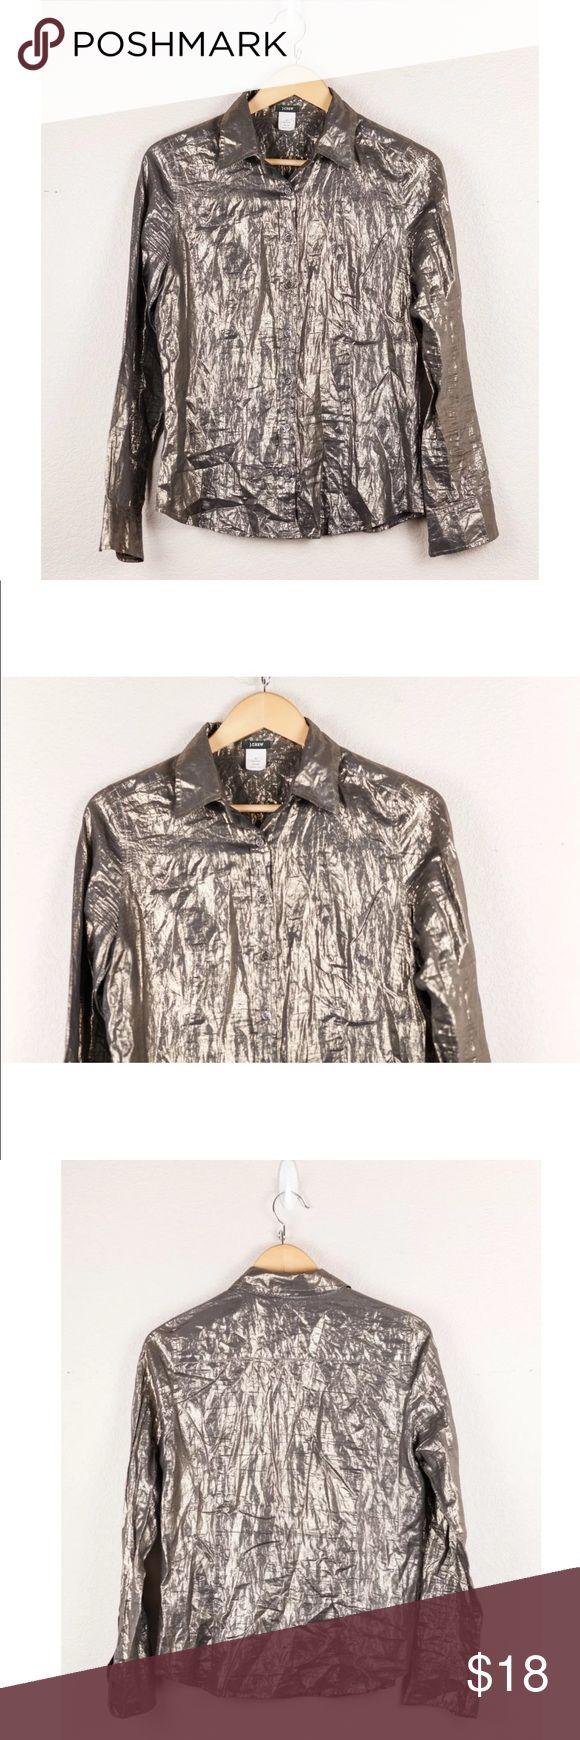 J. Crew Whisper Lamé Slim Shirt Gold Metallic L/S $110 J. Crew Whisper Lamé Slim Shirt Gold Metallic Long Sleeve Button Down Sz 6  Bust: 20  Waist: 18  Length: 24 J. Crew Tops Button Down Shirts